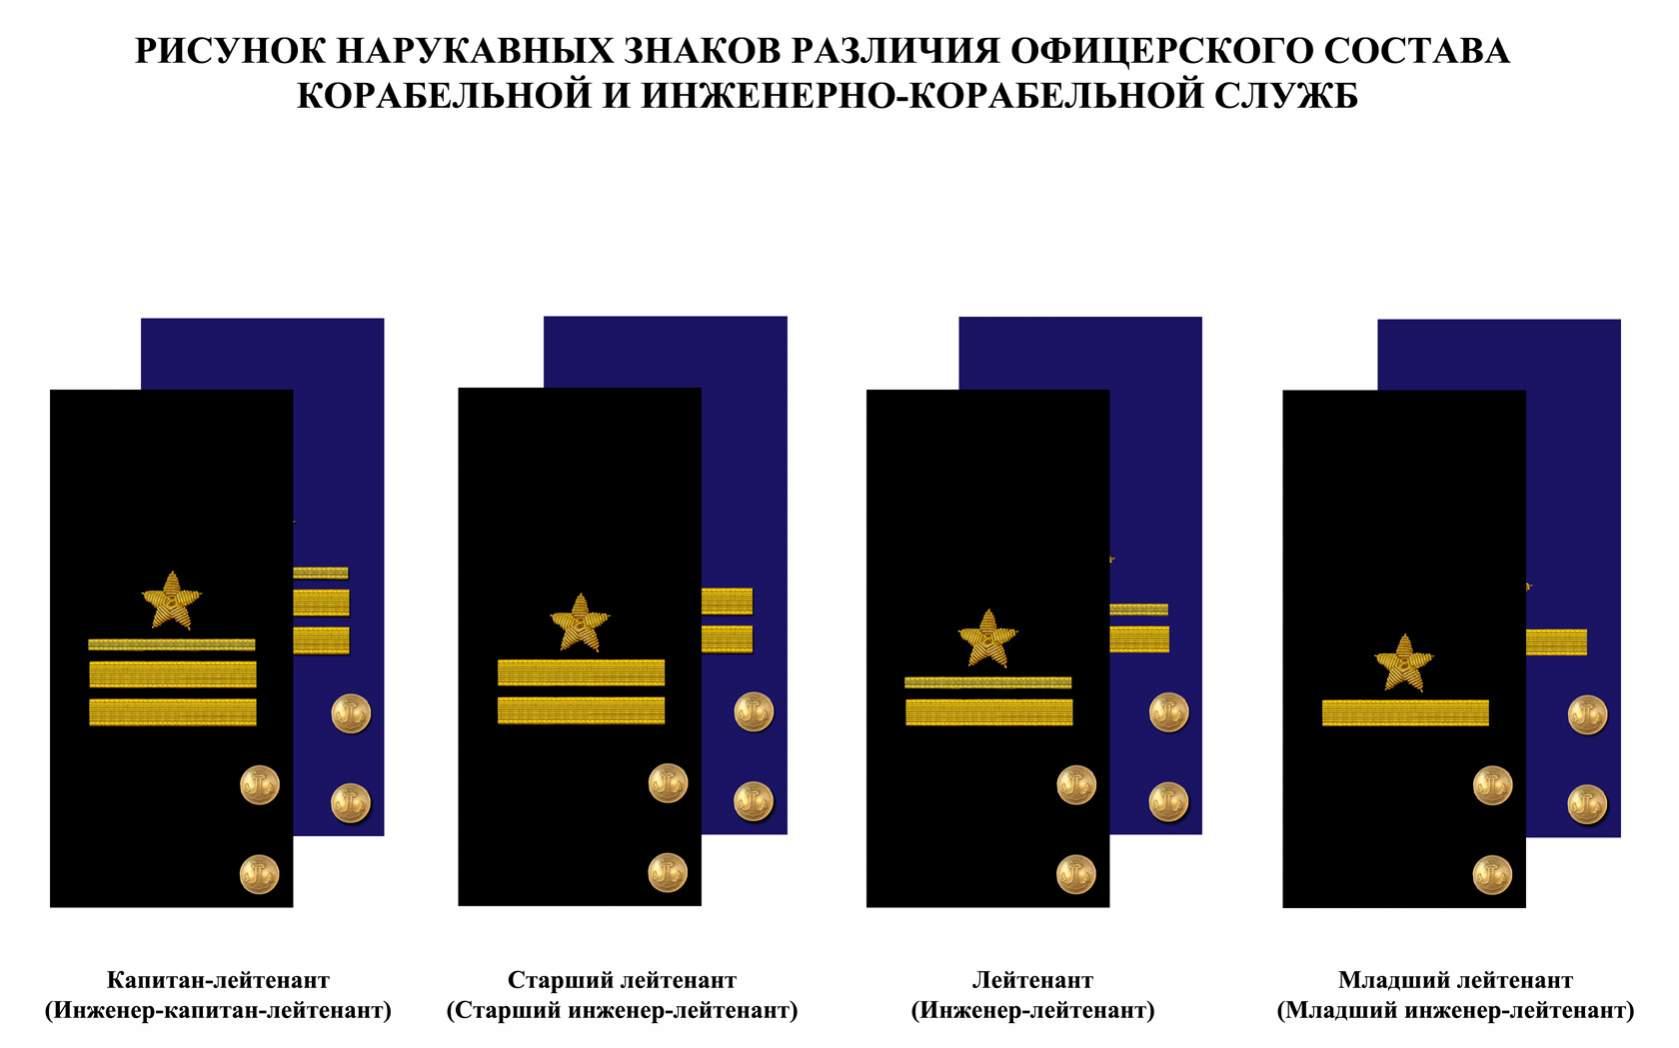 Soviet Officer Ranks Name Soviet Navy Officers